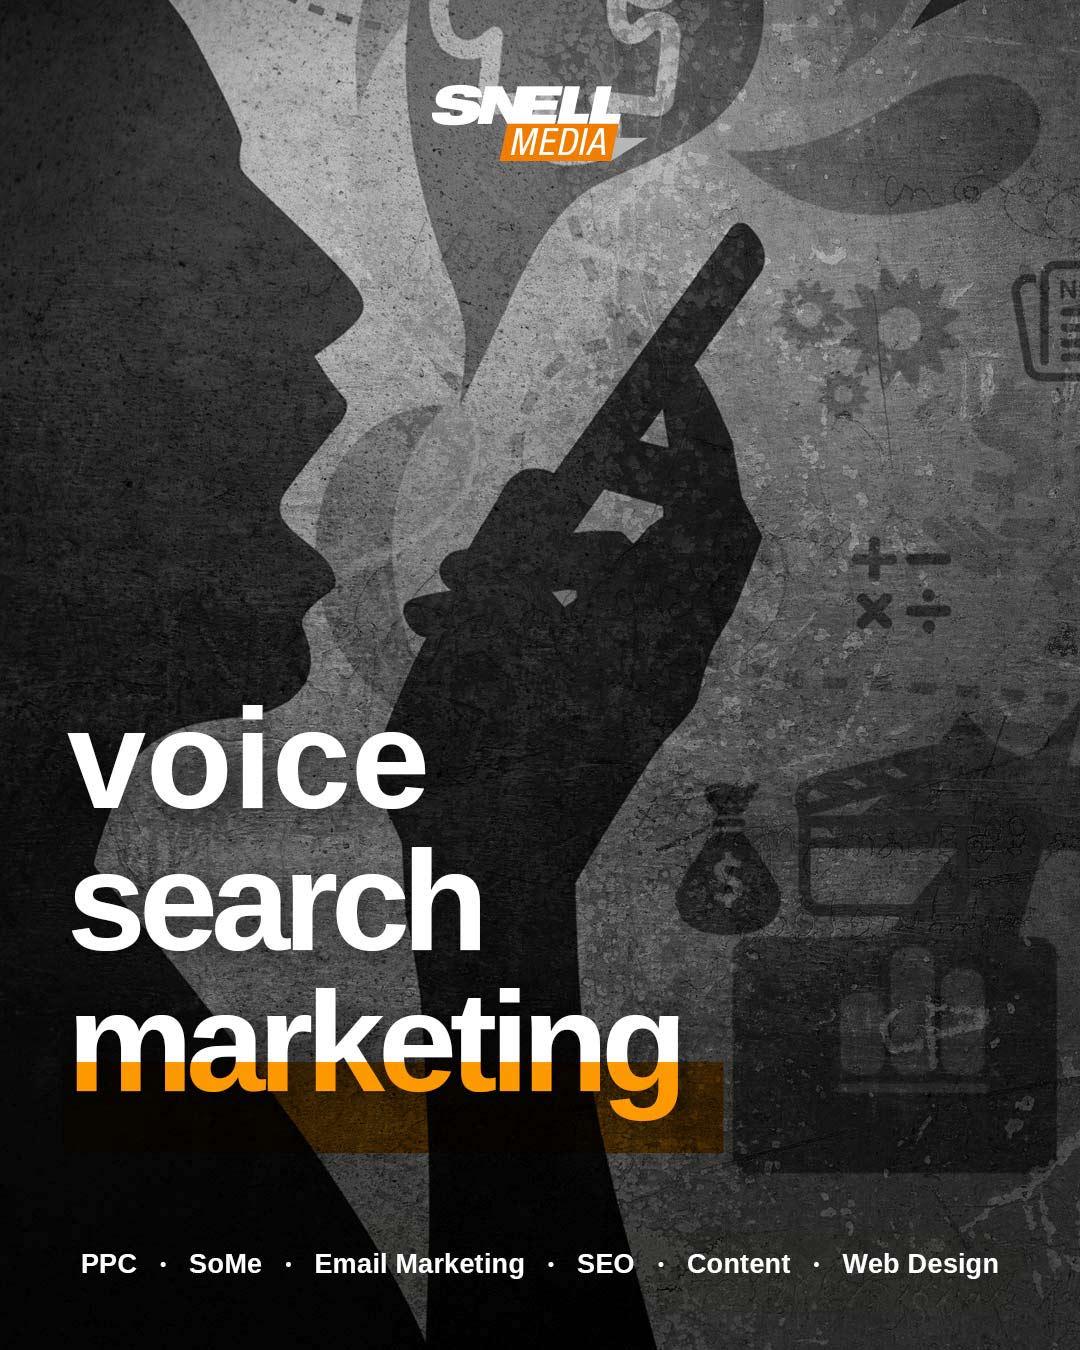 Voice Search Marketing 13th B2B Digital Marketing Trend